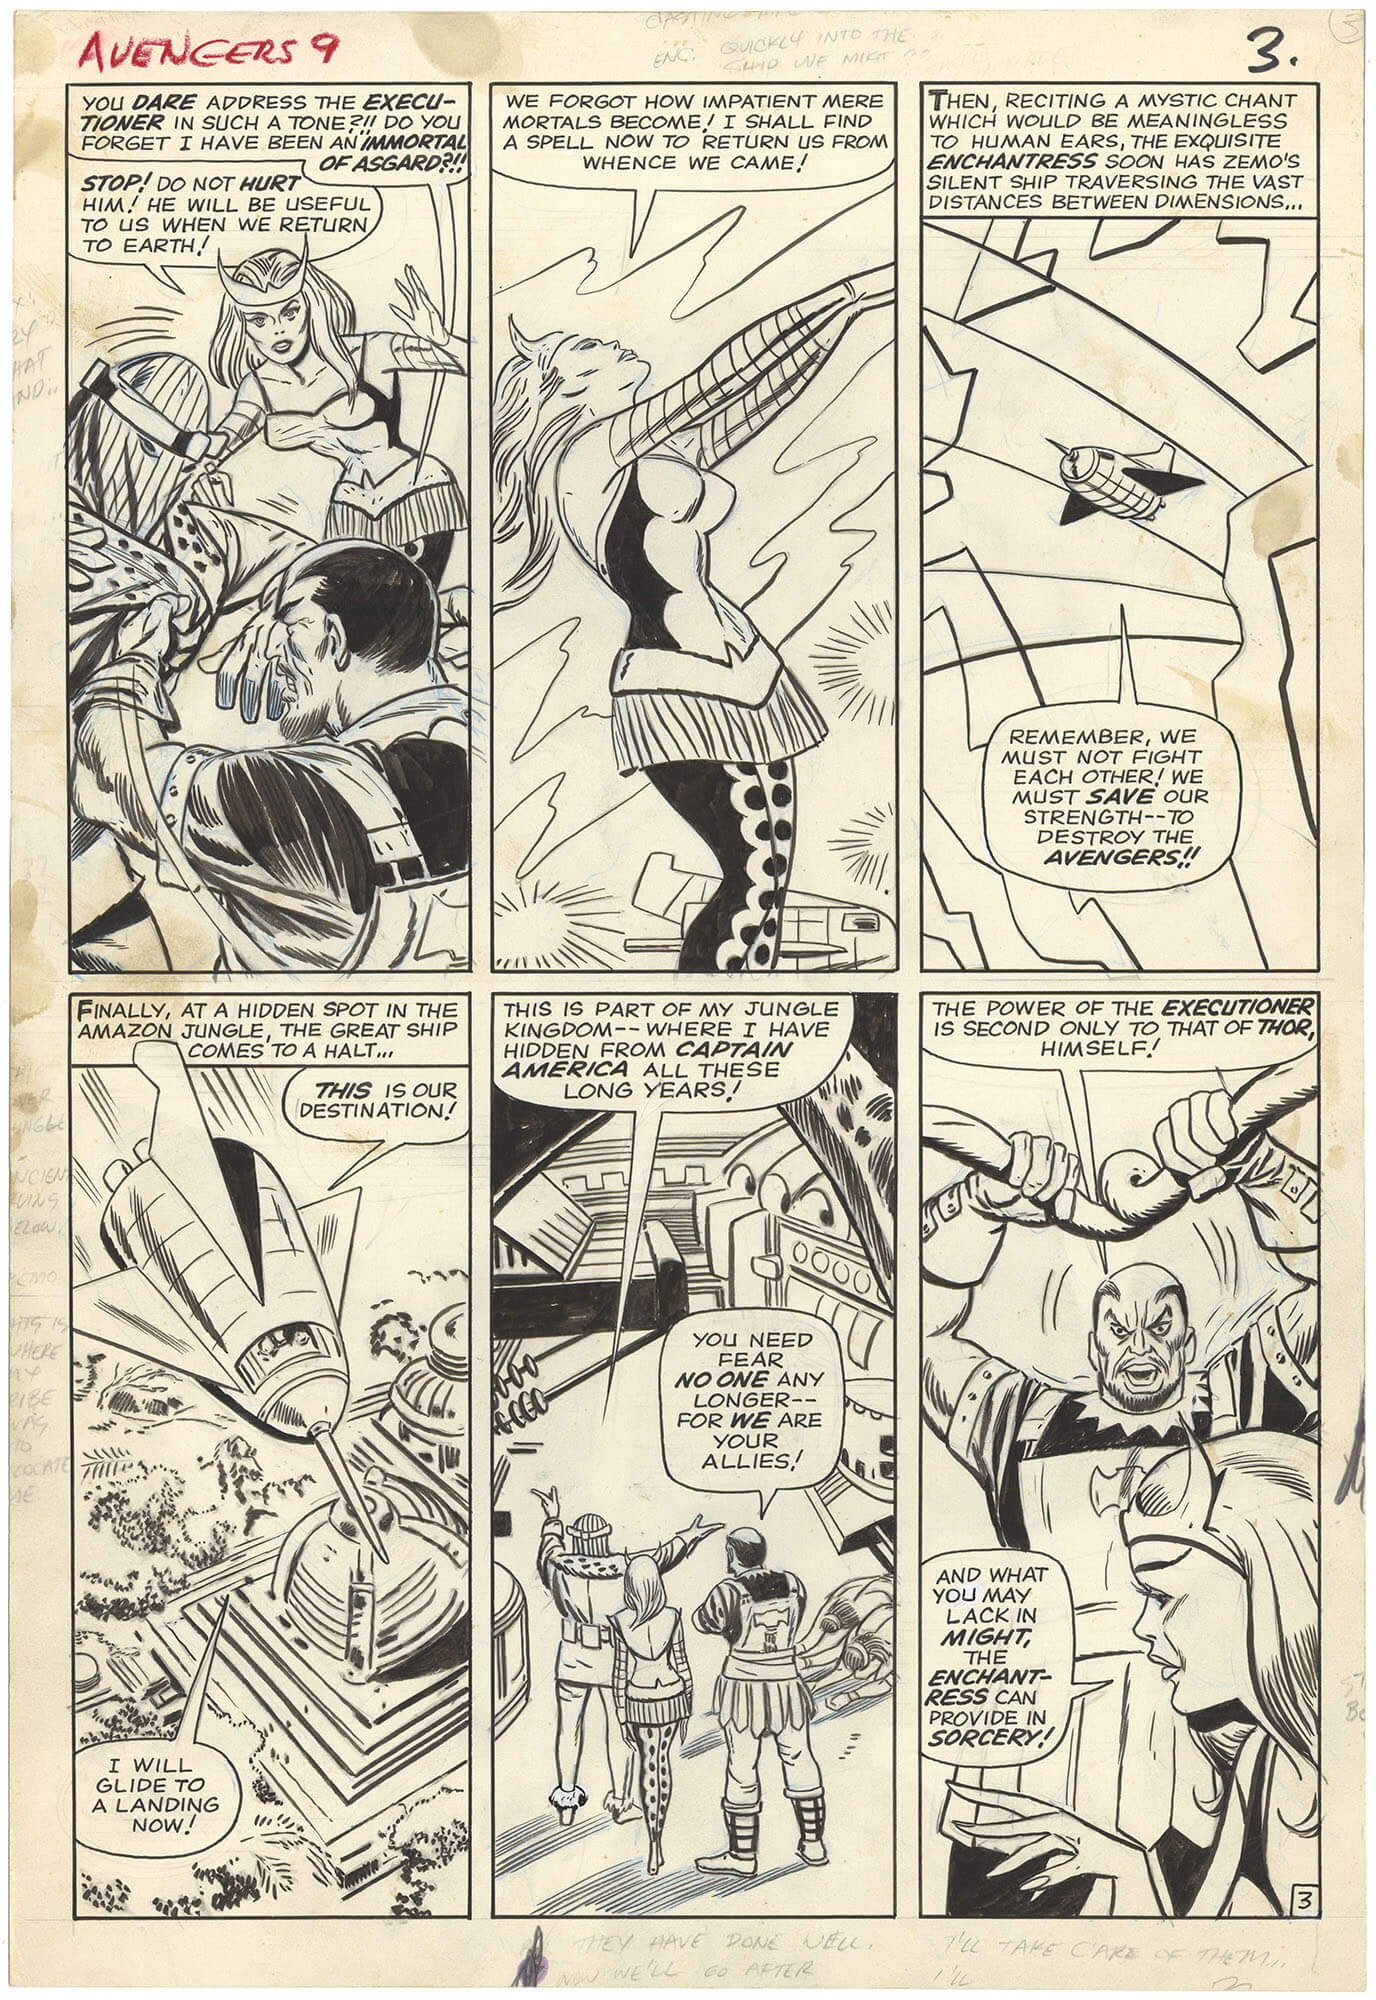 Avengers #9 p3 (Large Art)